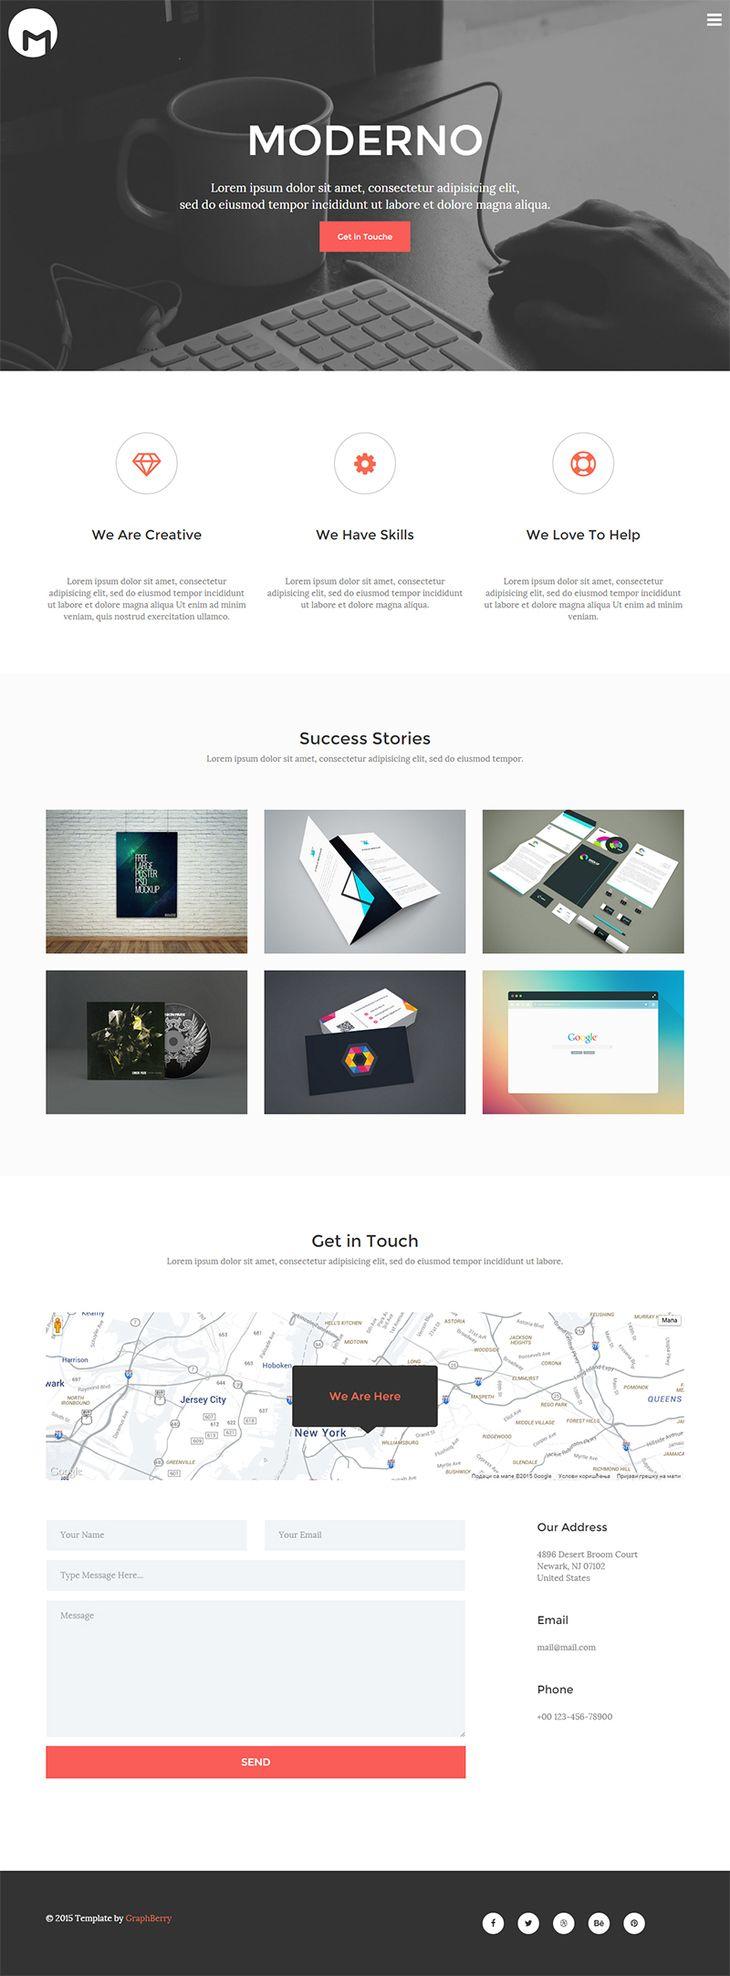 Moderno Free Html5 Responsive Template Fribly Portfolio Web Design Simple Web Design Web Design